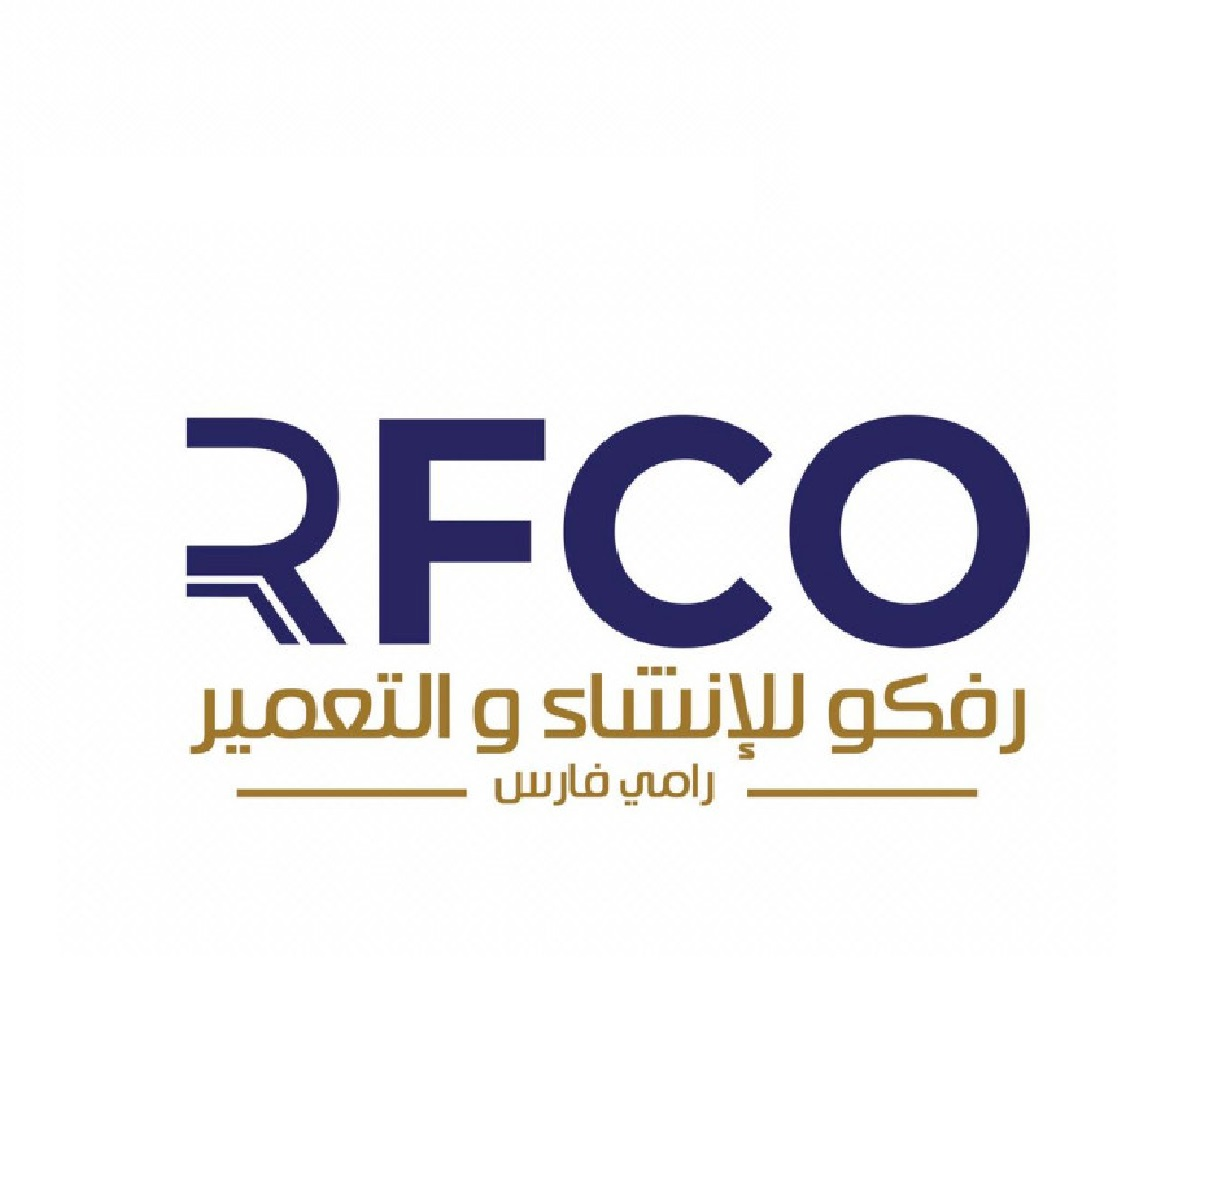 rfco development